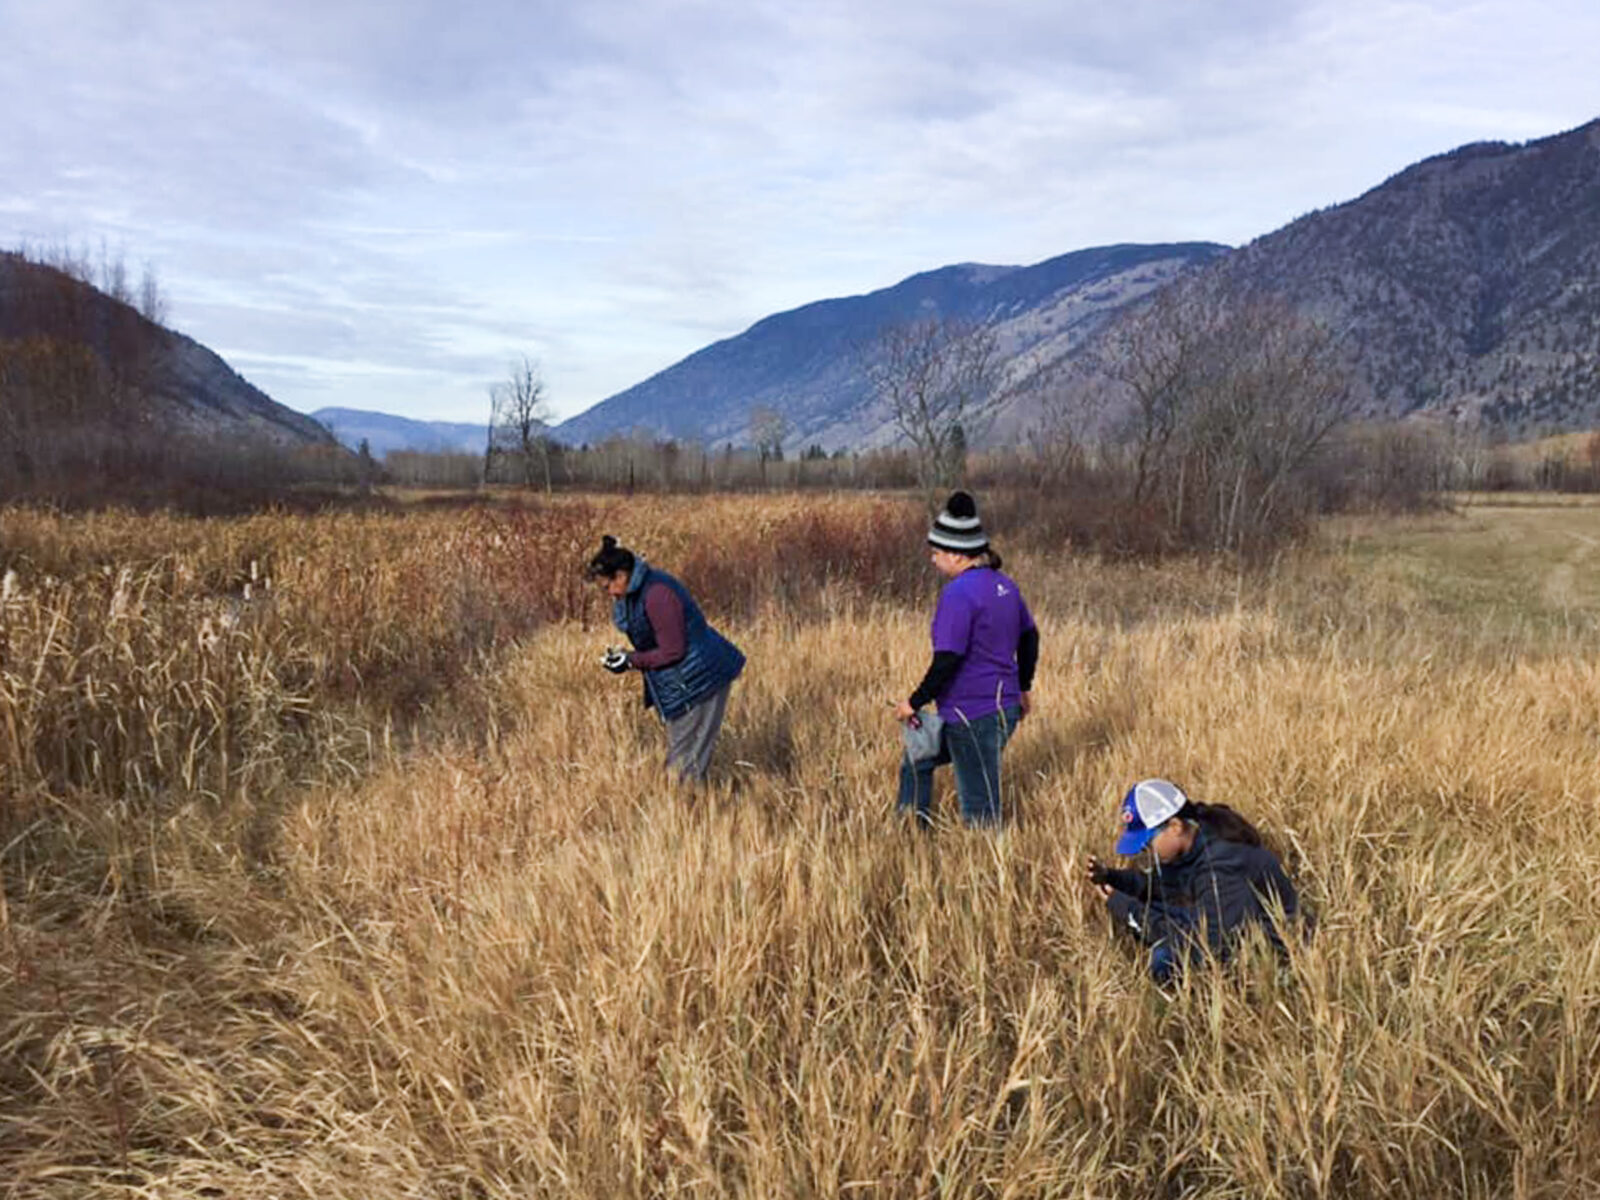 Lower Similkameen people harvesting hemp for Oral Histories Project in B.C.